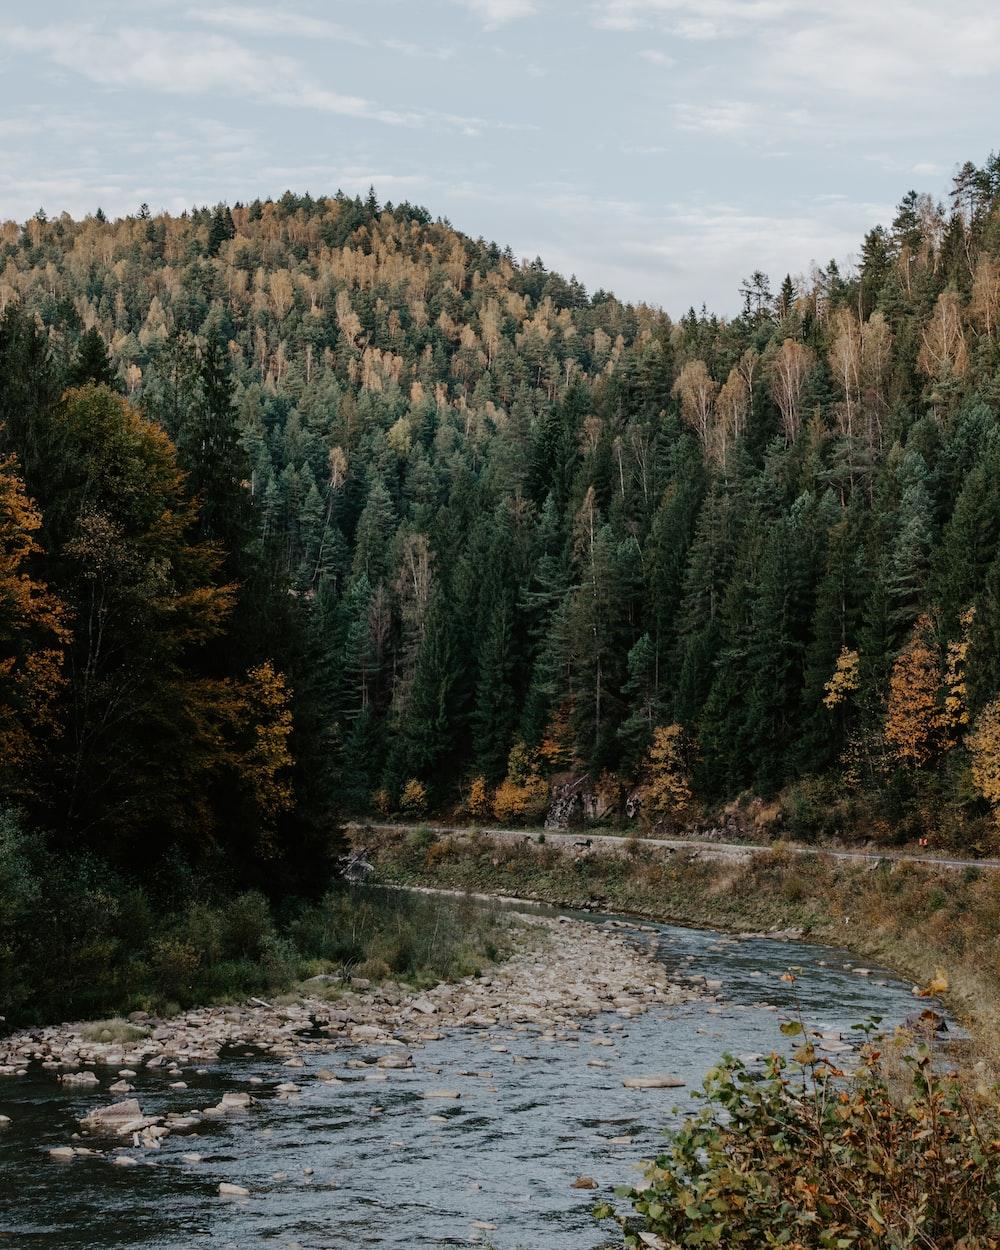 trees beside water stream